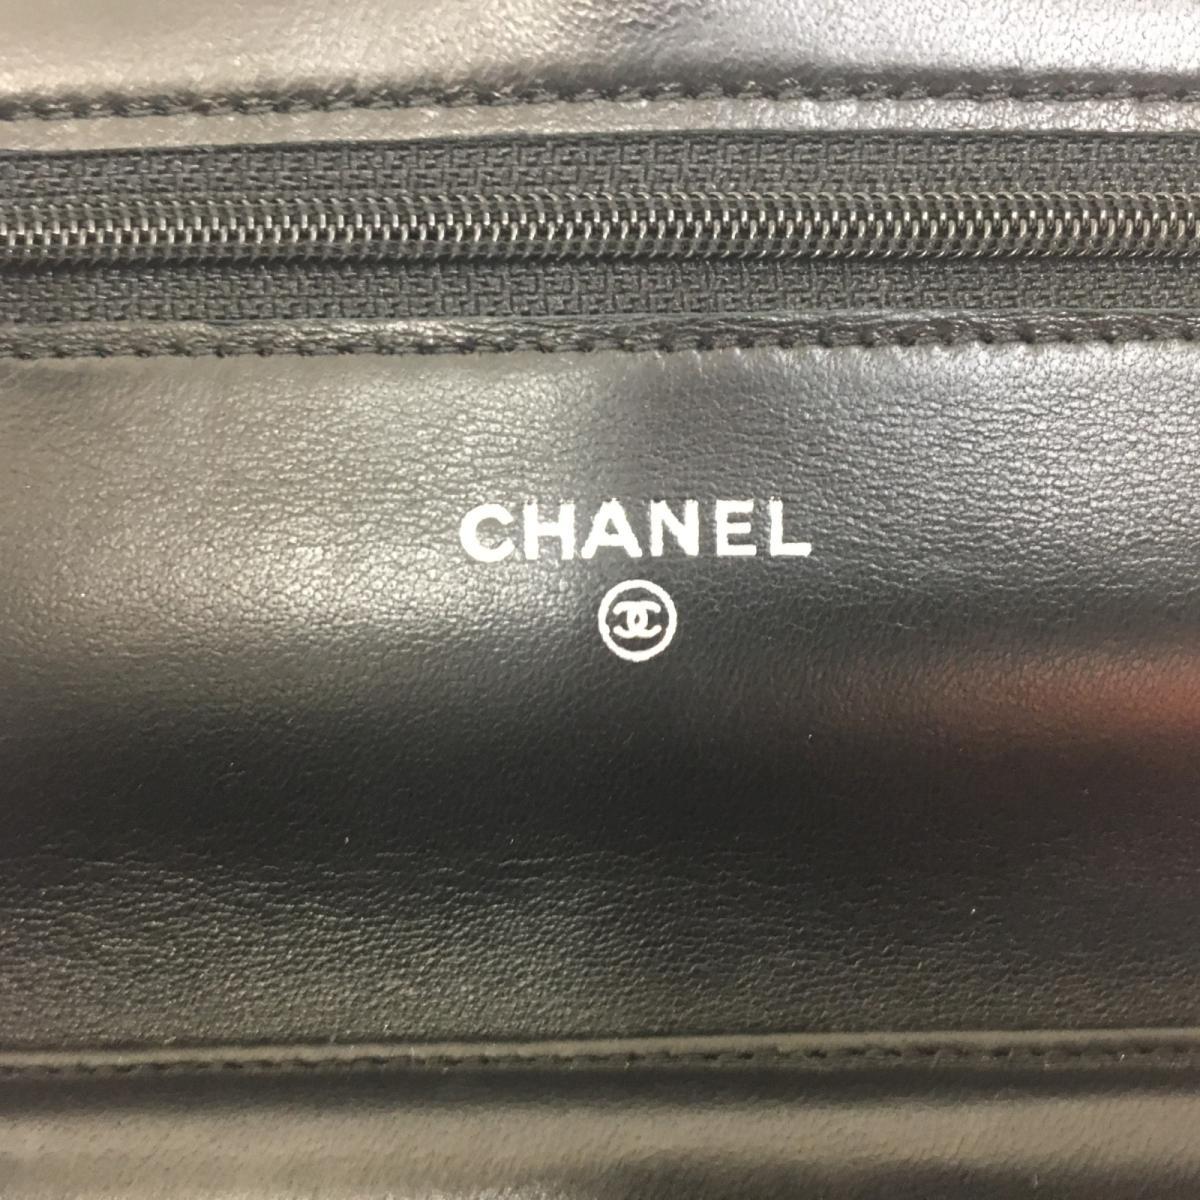 b7f6dbef65 ... Auth CHANEL Chain wallet shoulder crossbody bag Purse Lamb leather  Black Used Vintage   BRANDOFF Ginza ...